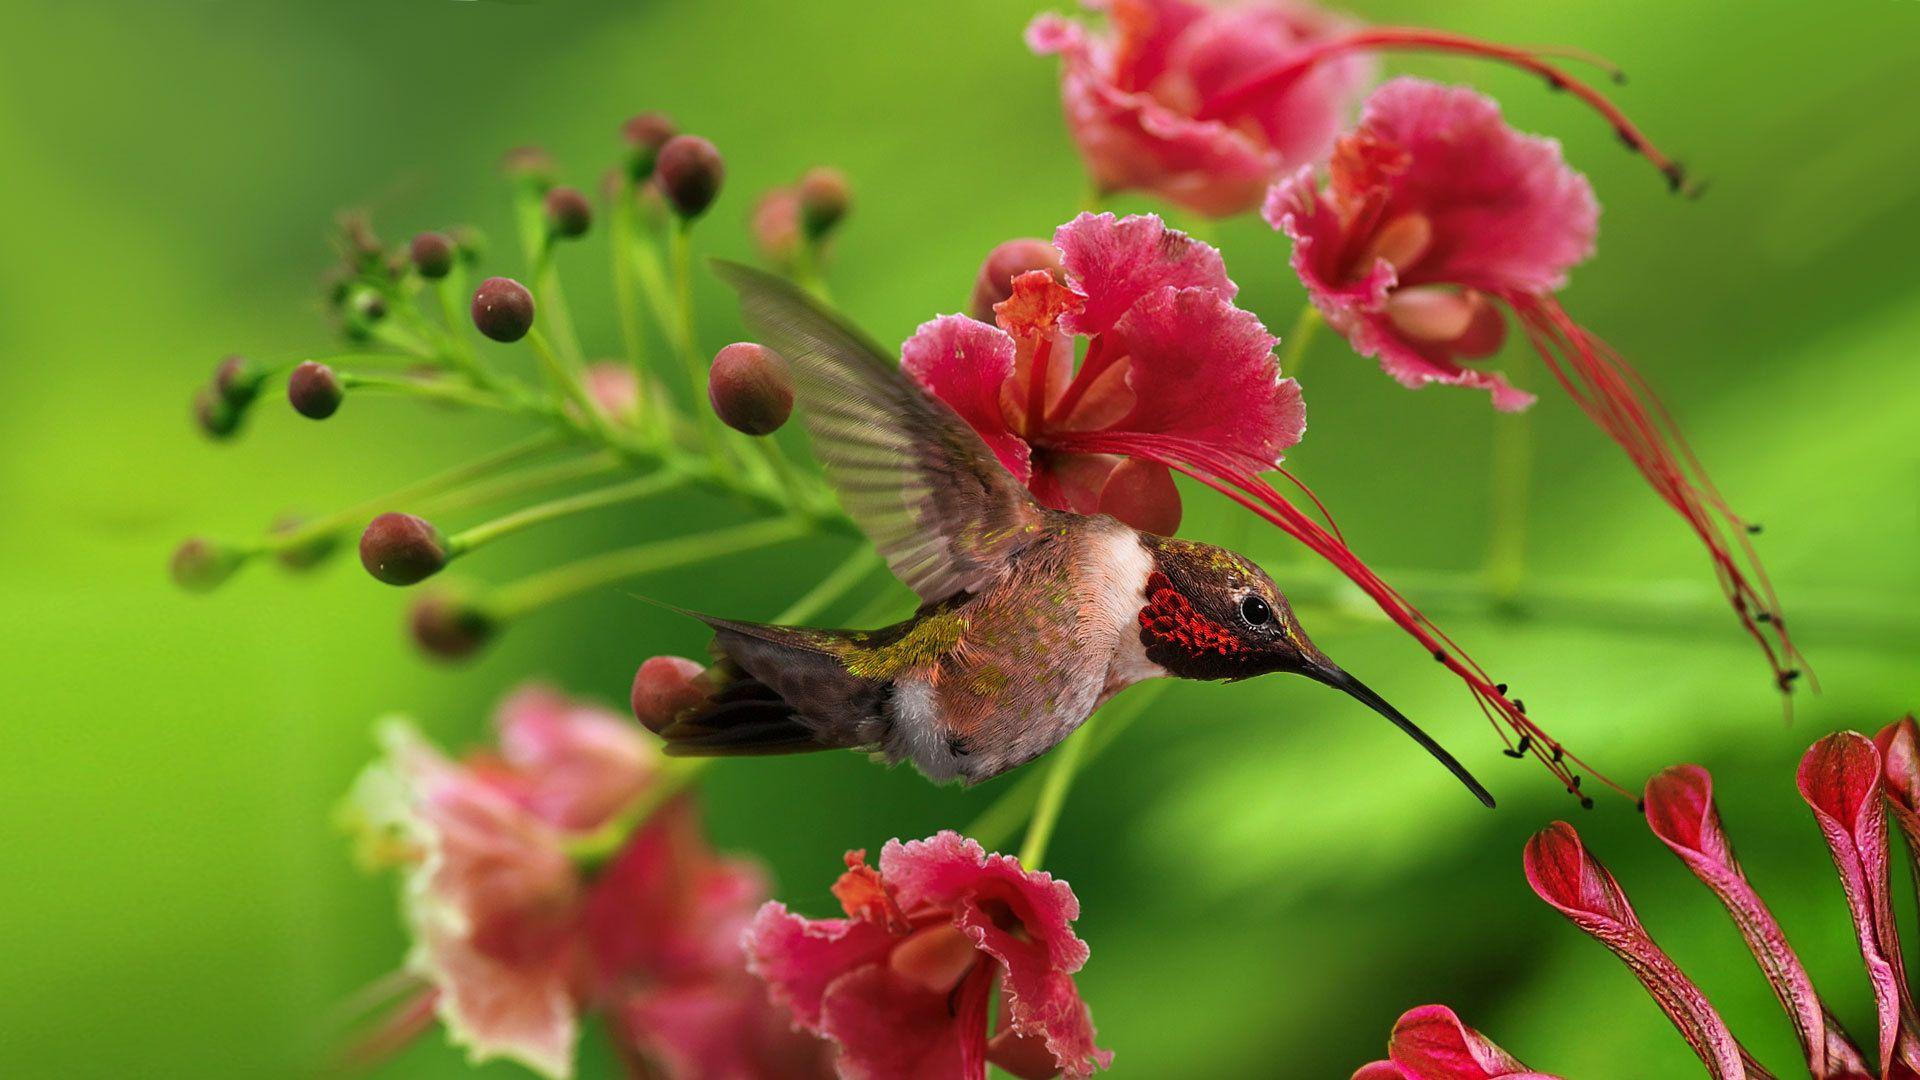 Beautiful Hummingbird and Flowers Hummingbird wallpaper